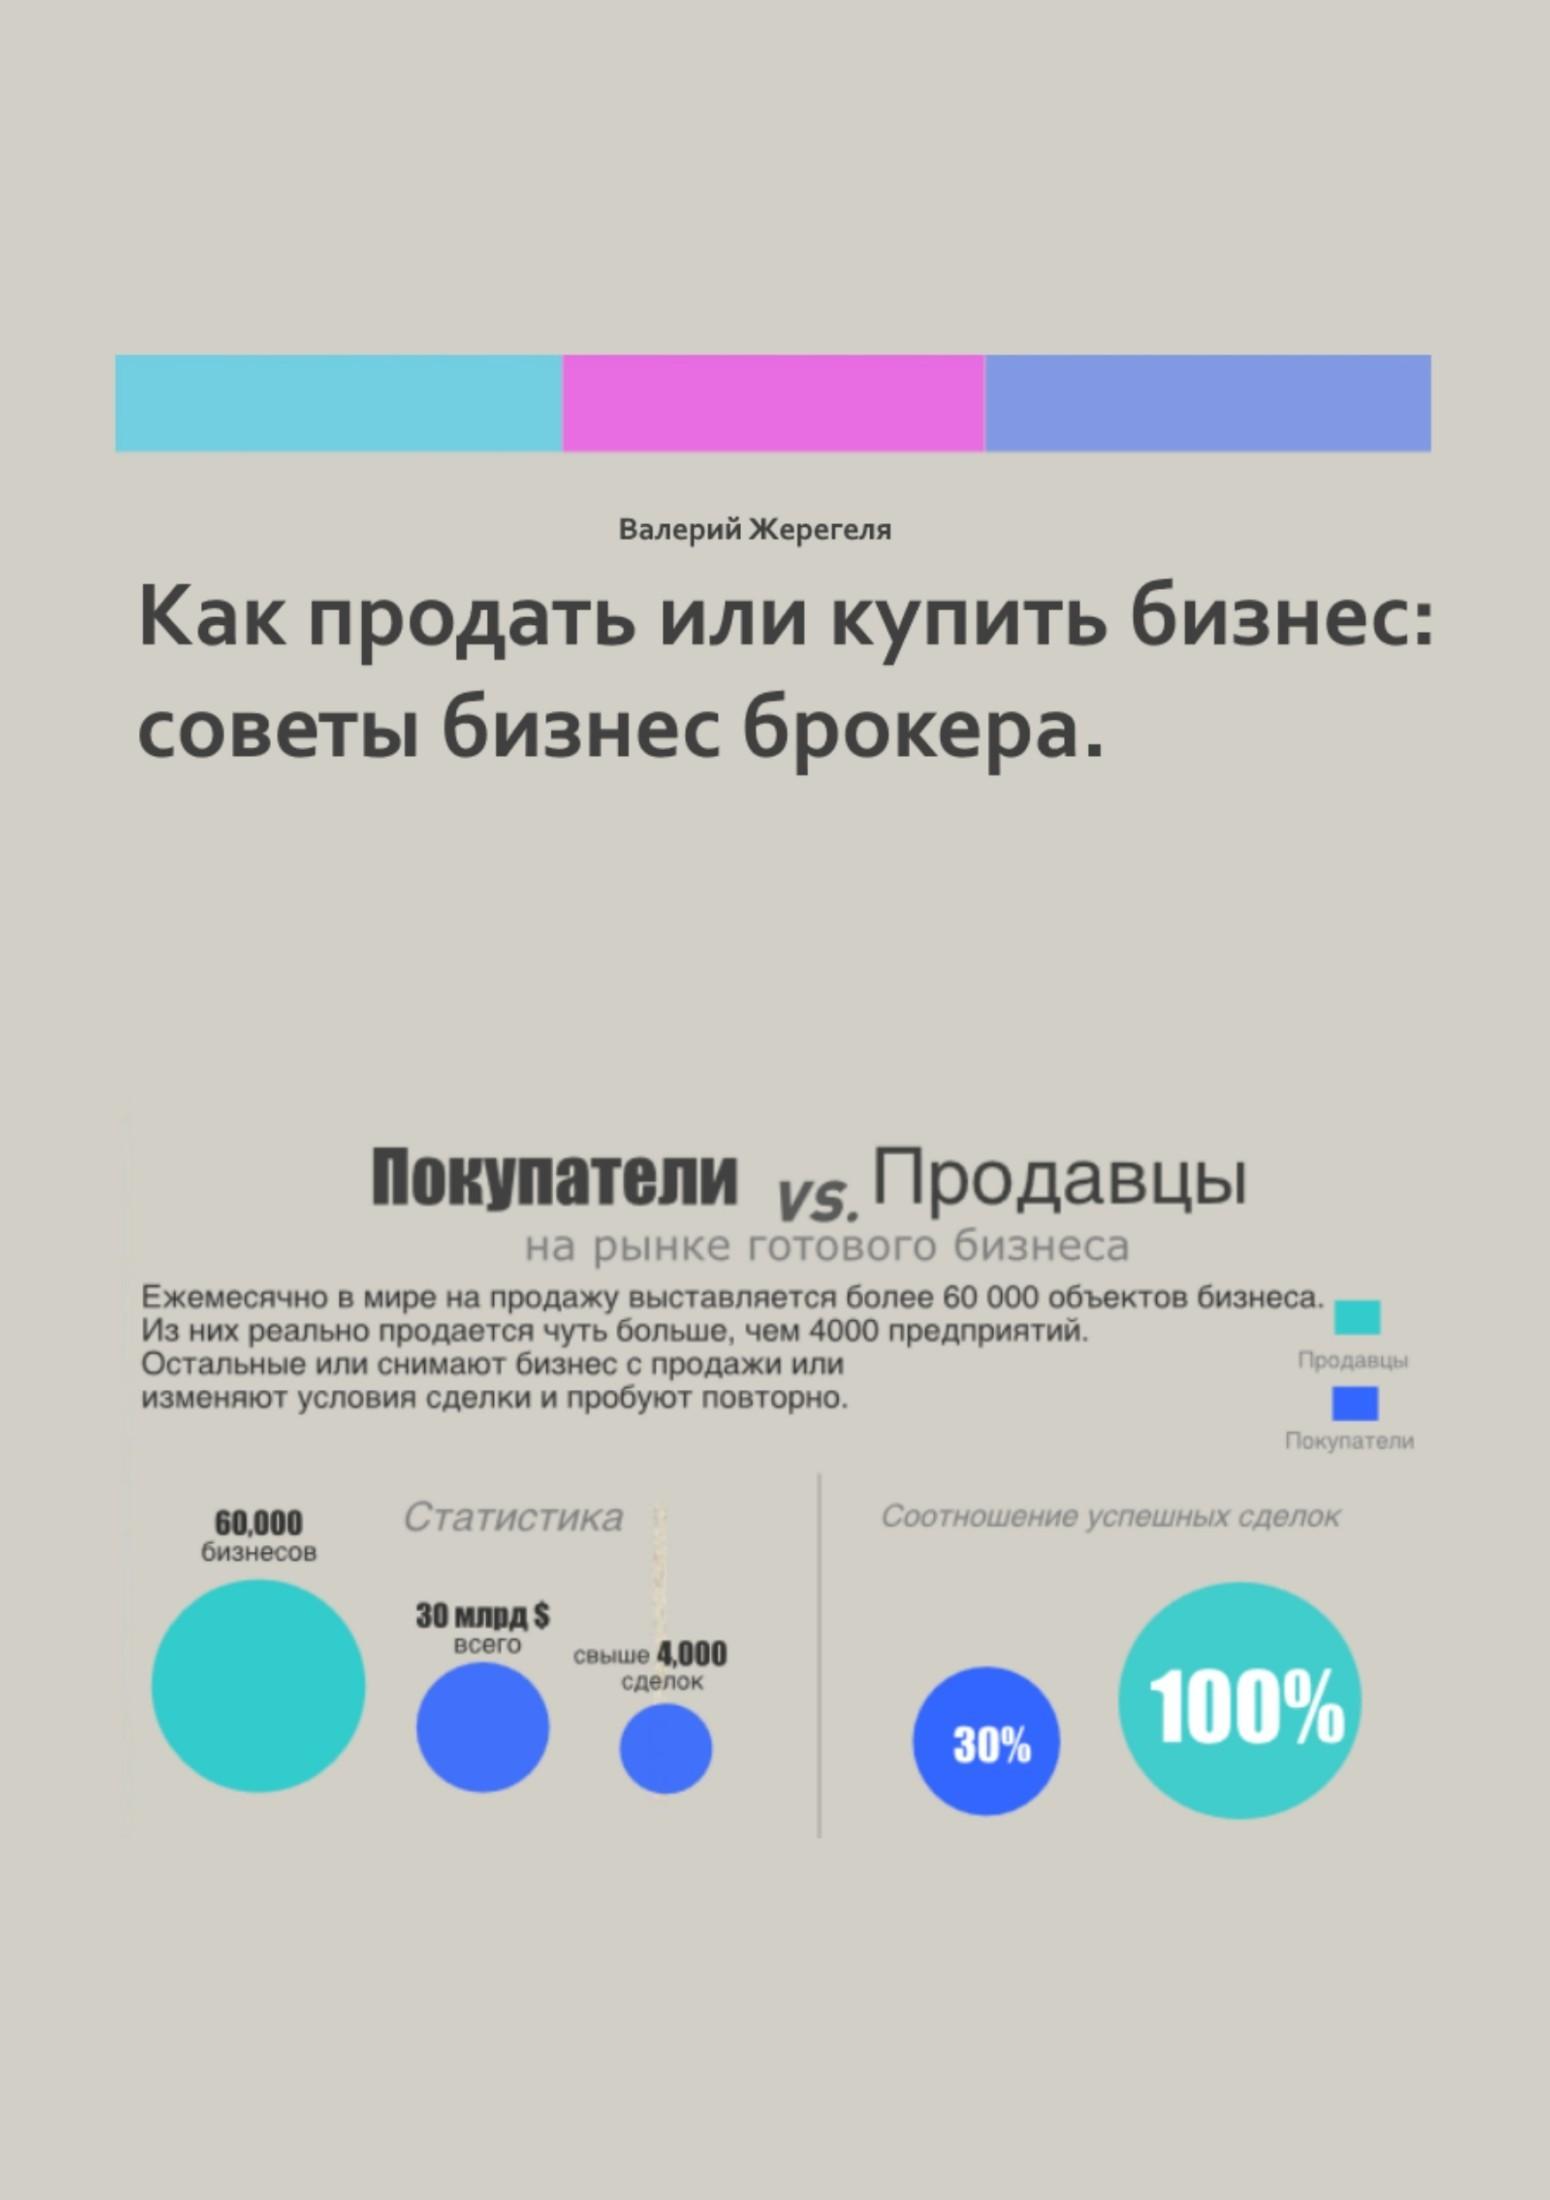 Валерий Александрович Жерегеля Как или бизнес: советы бизнес брокера